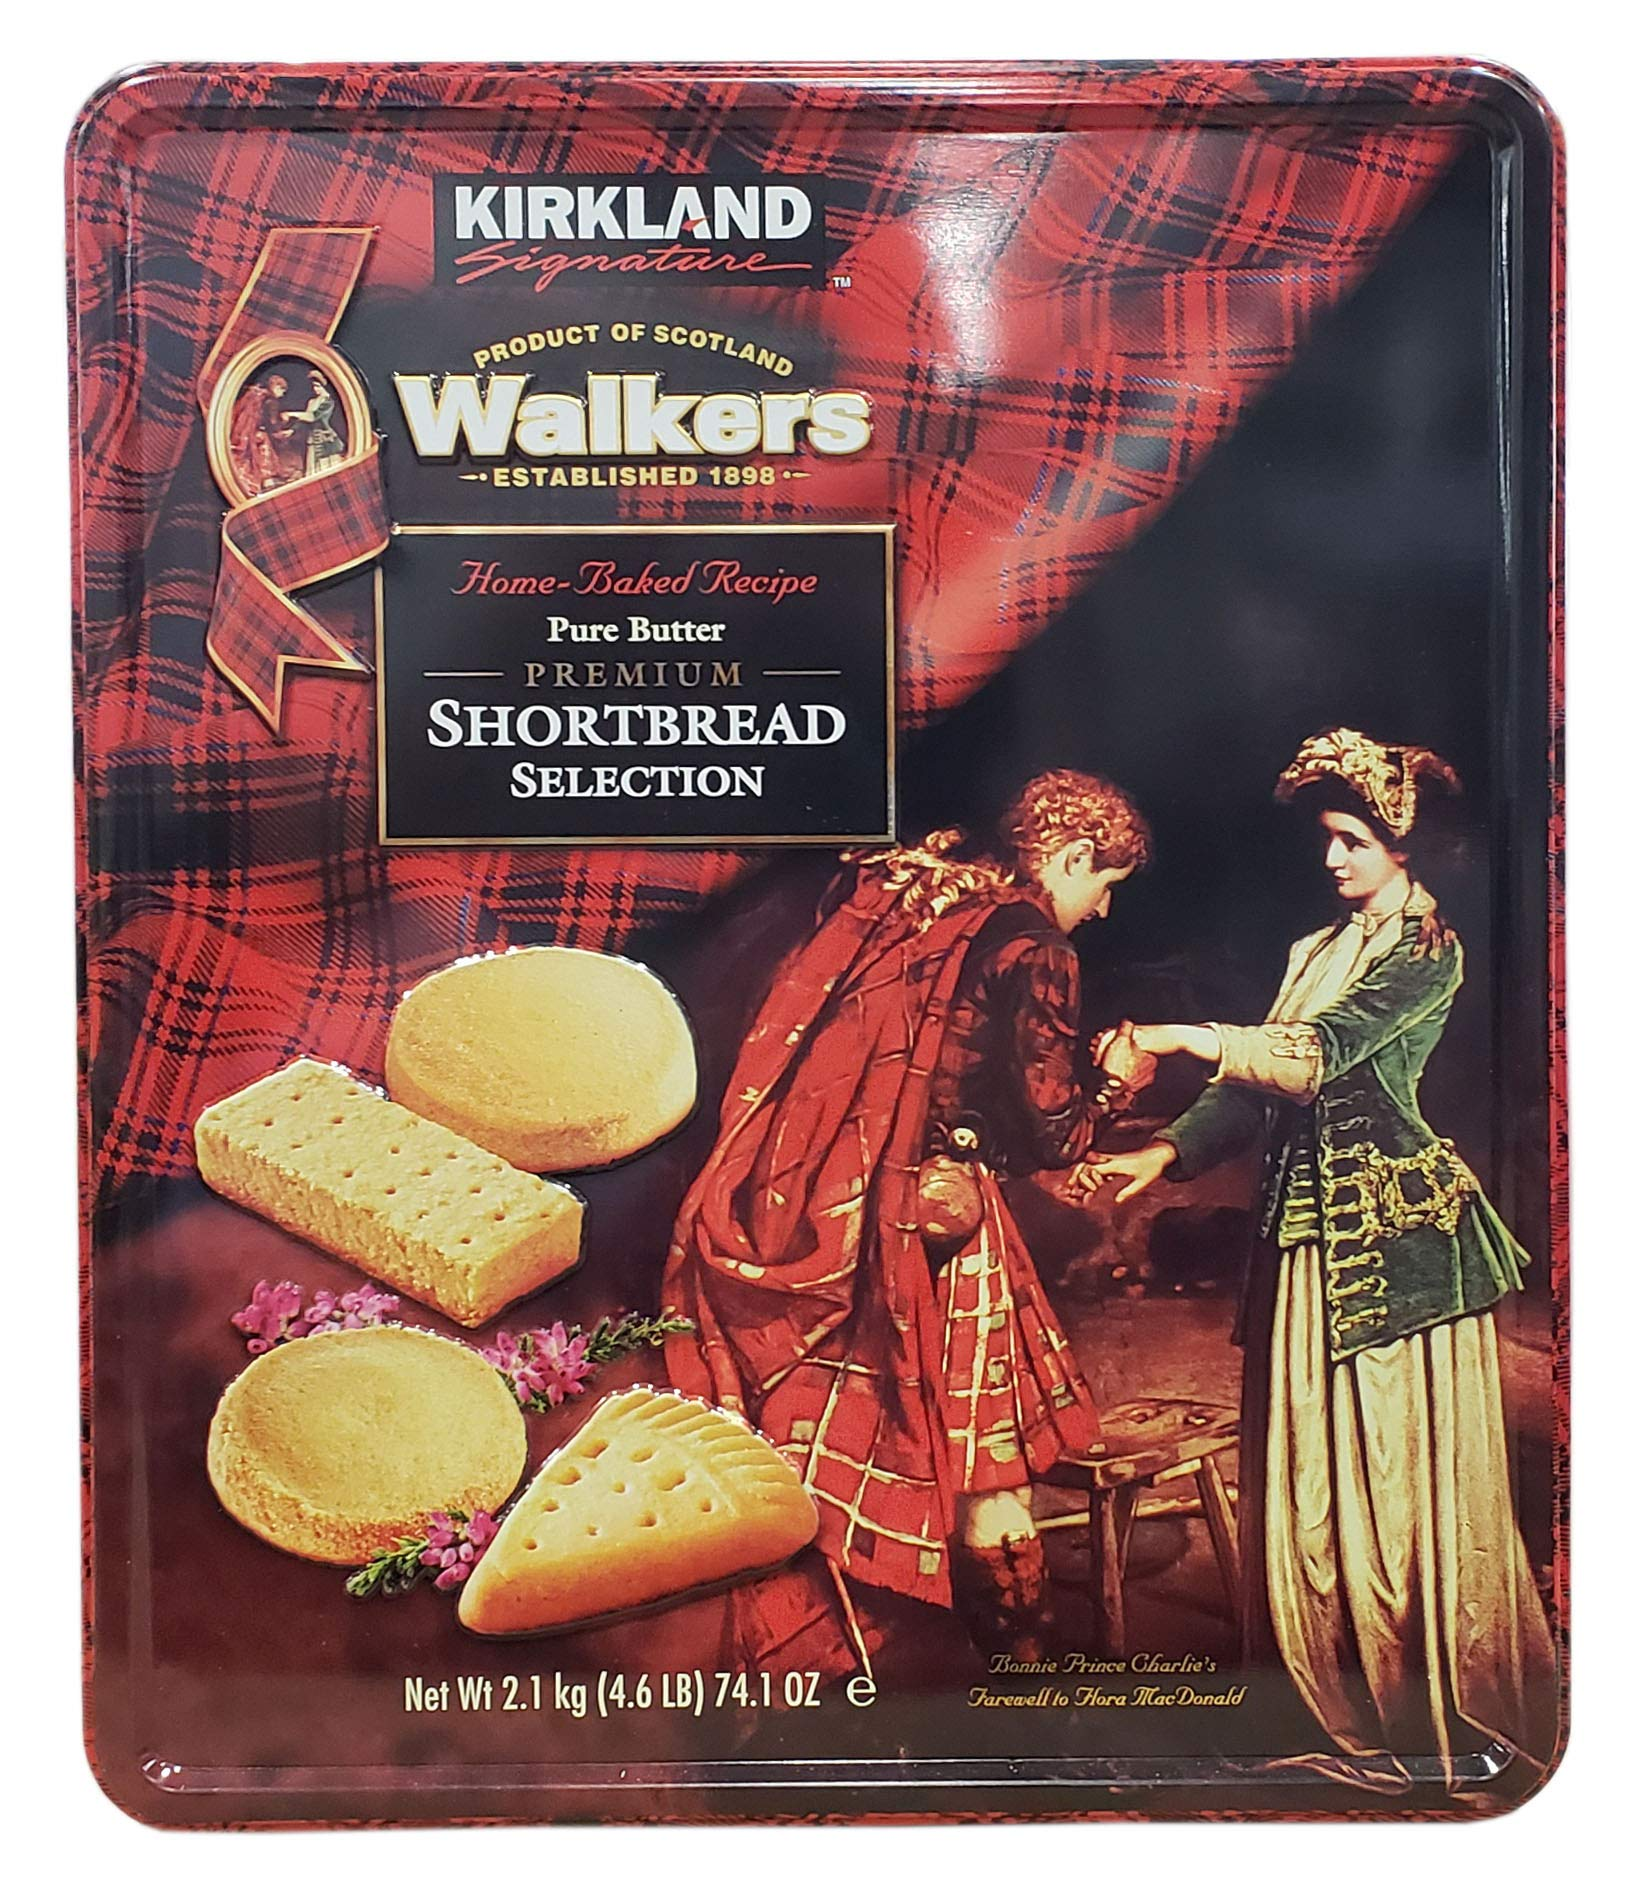 Kirkland Signature Walkers Premium Shortbread Selection Gift Tin, 4.6 Pound by Kirkland Signature Walkers